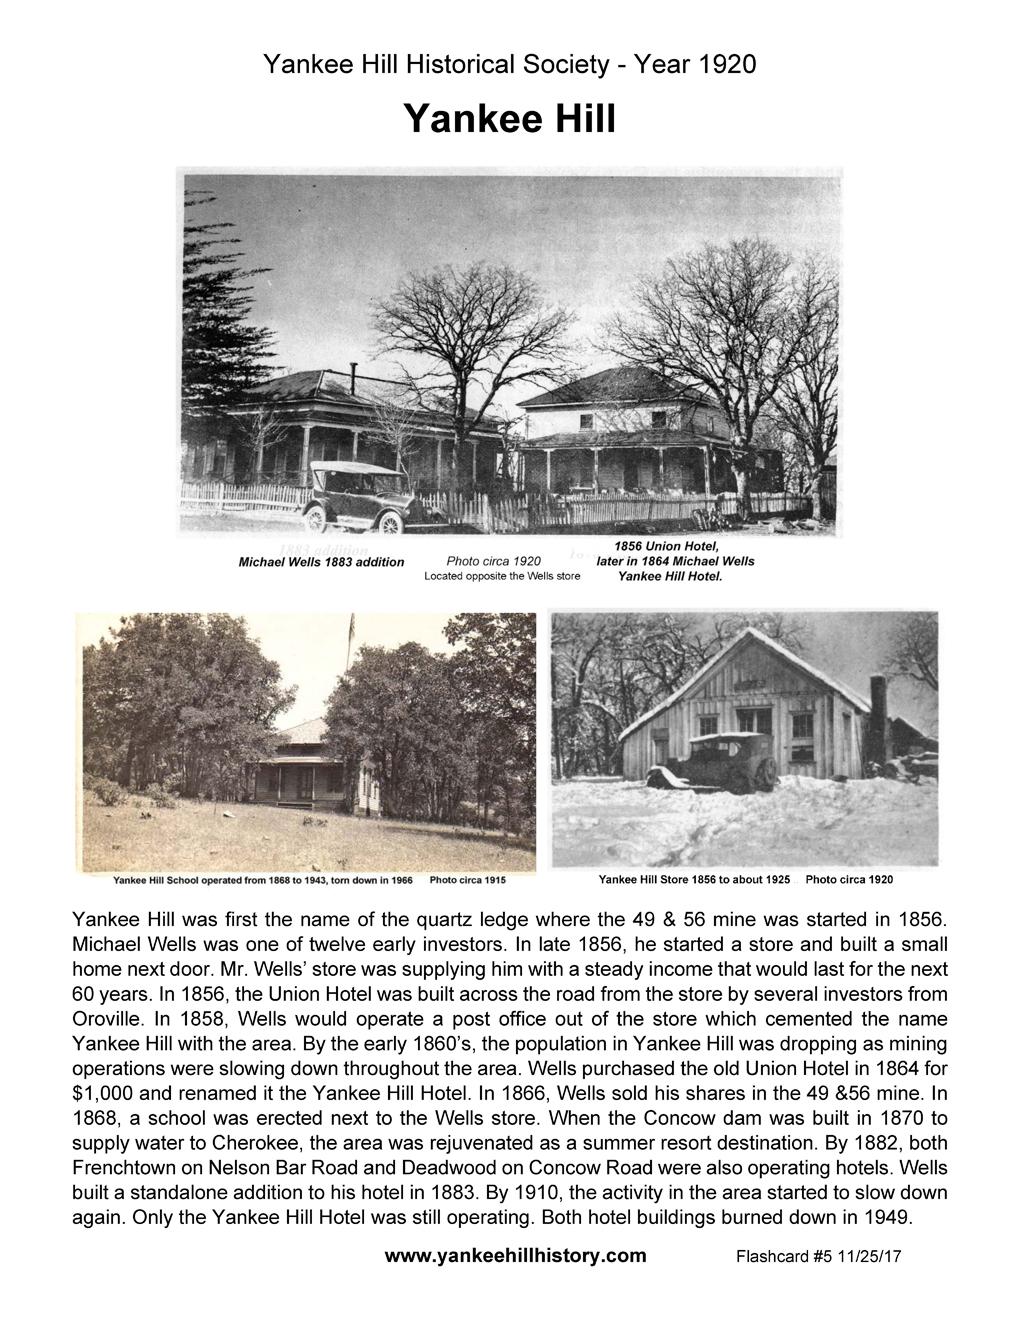 Flashcards - Yankee Hill Historical Society